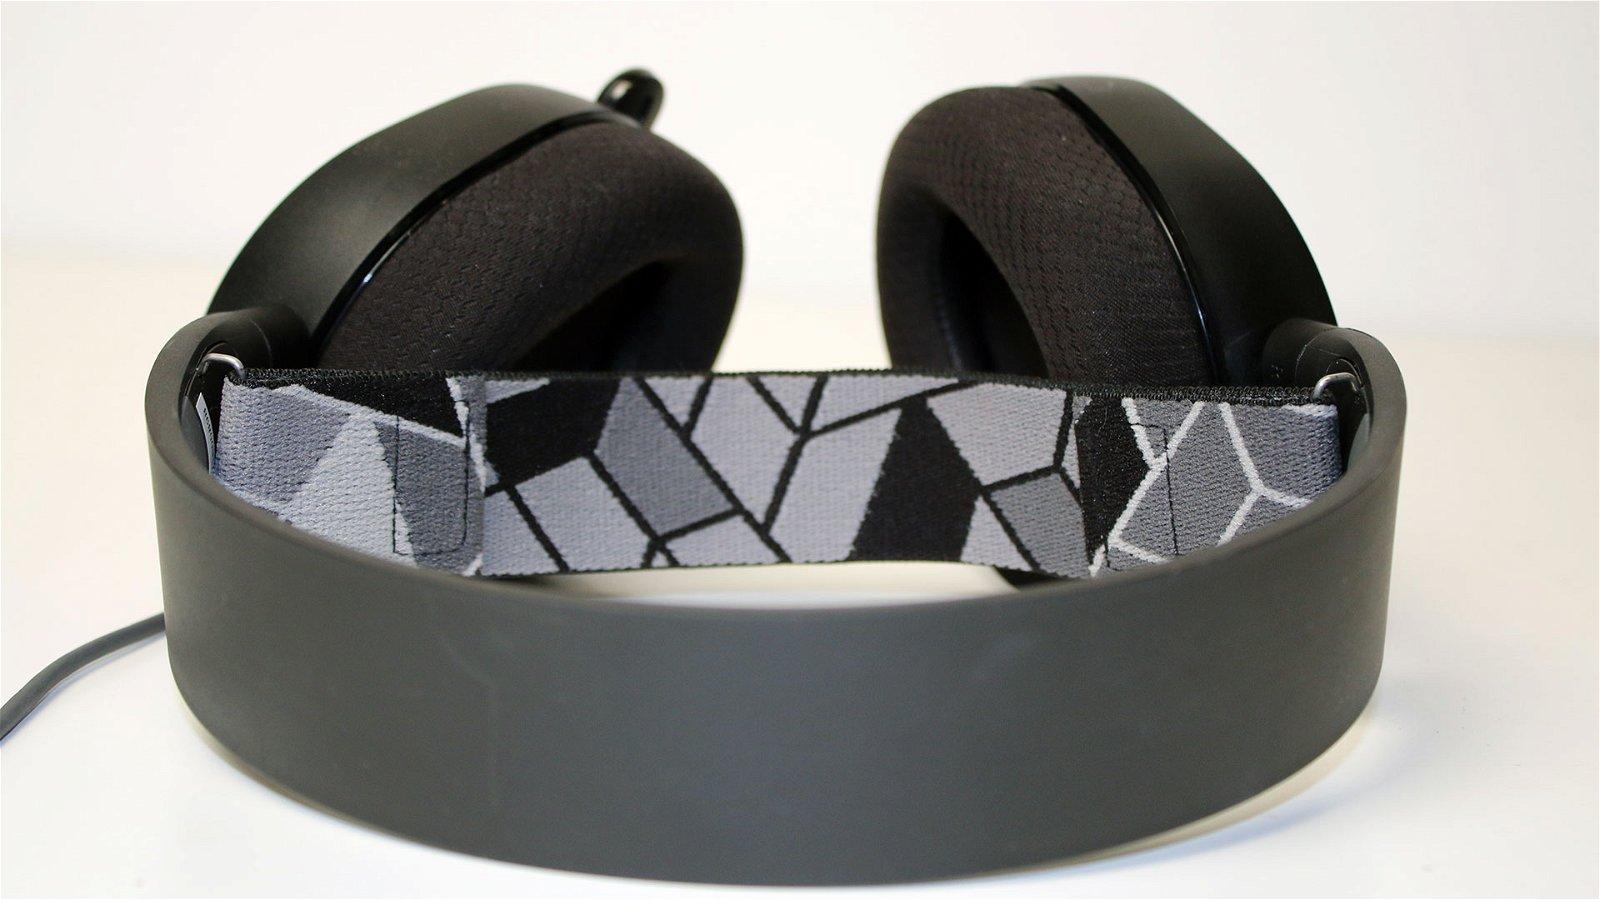 Steelseries Arctis 3 (Headset) Review 2